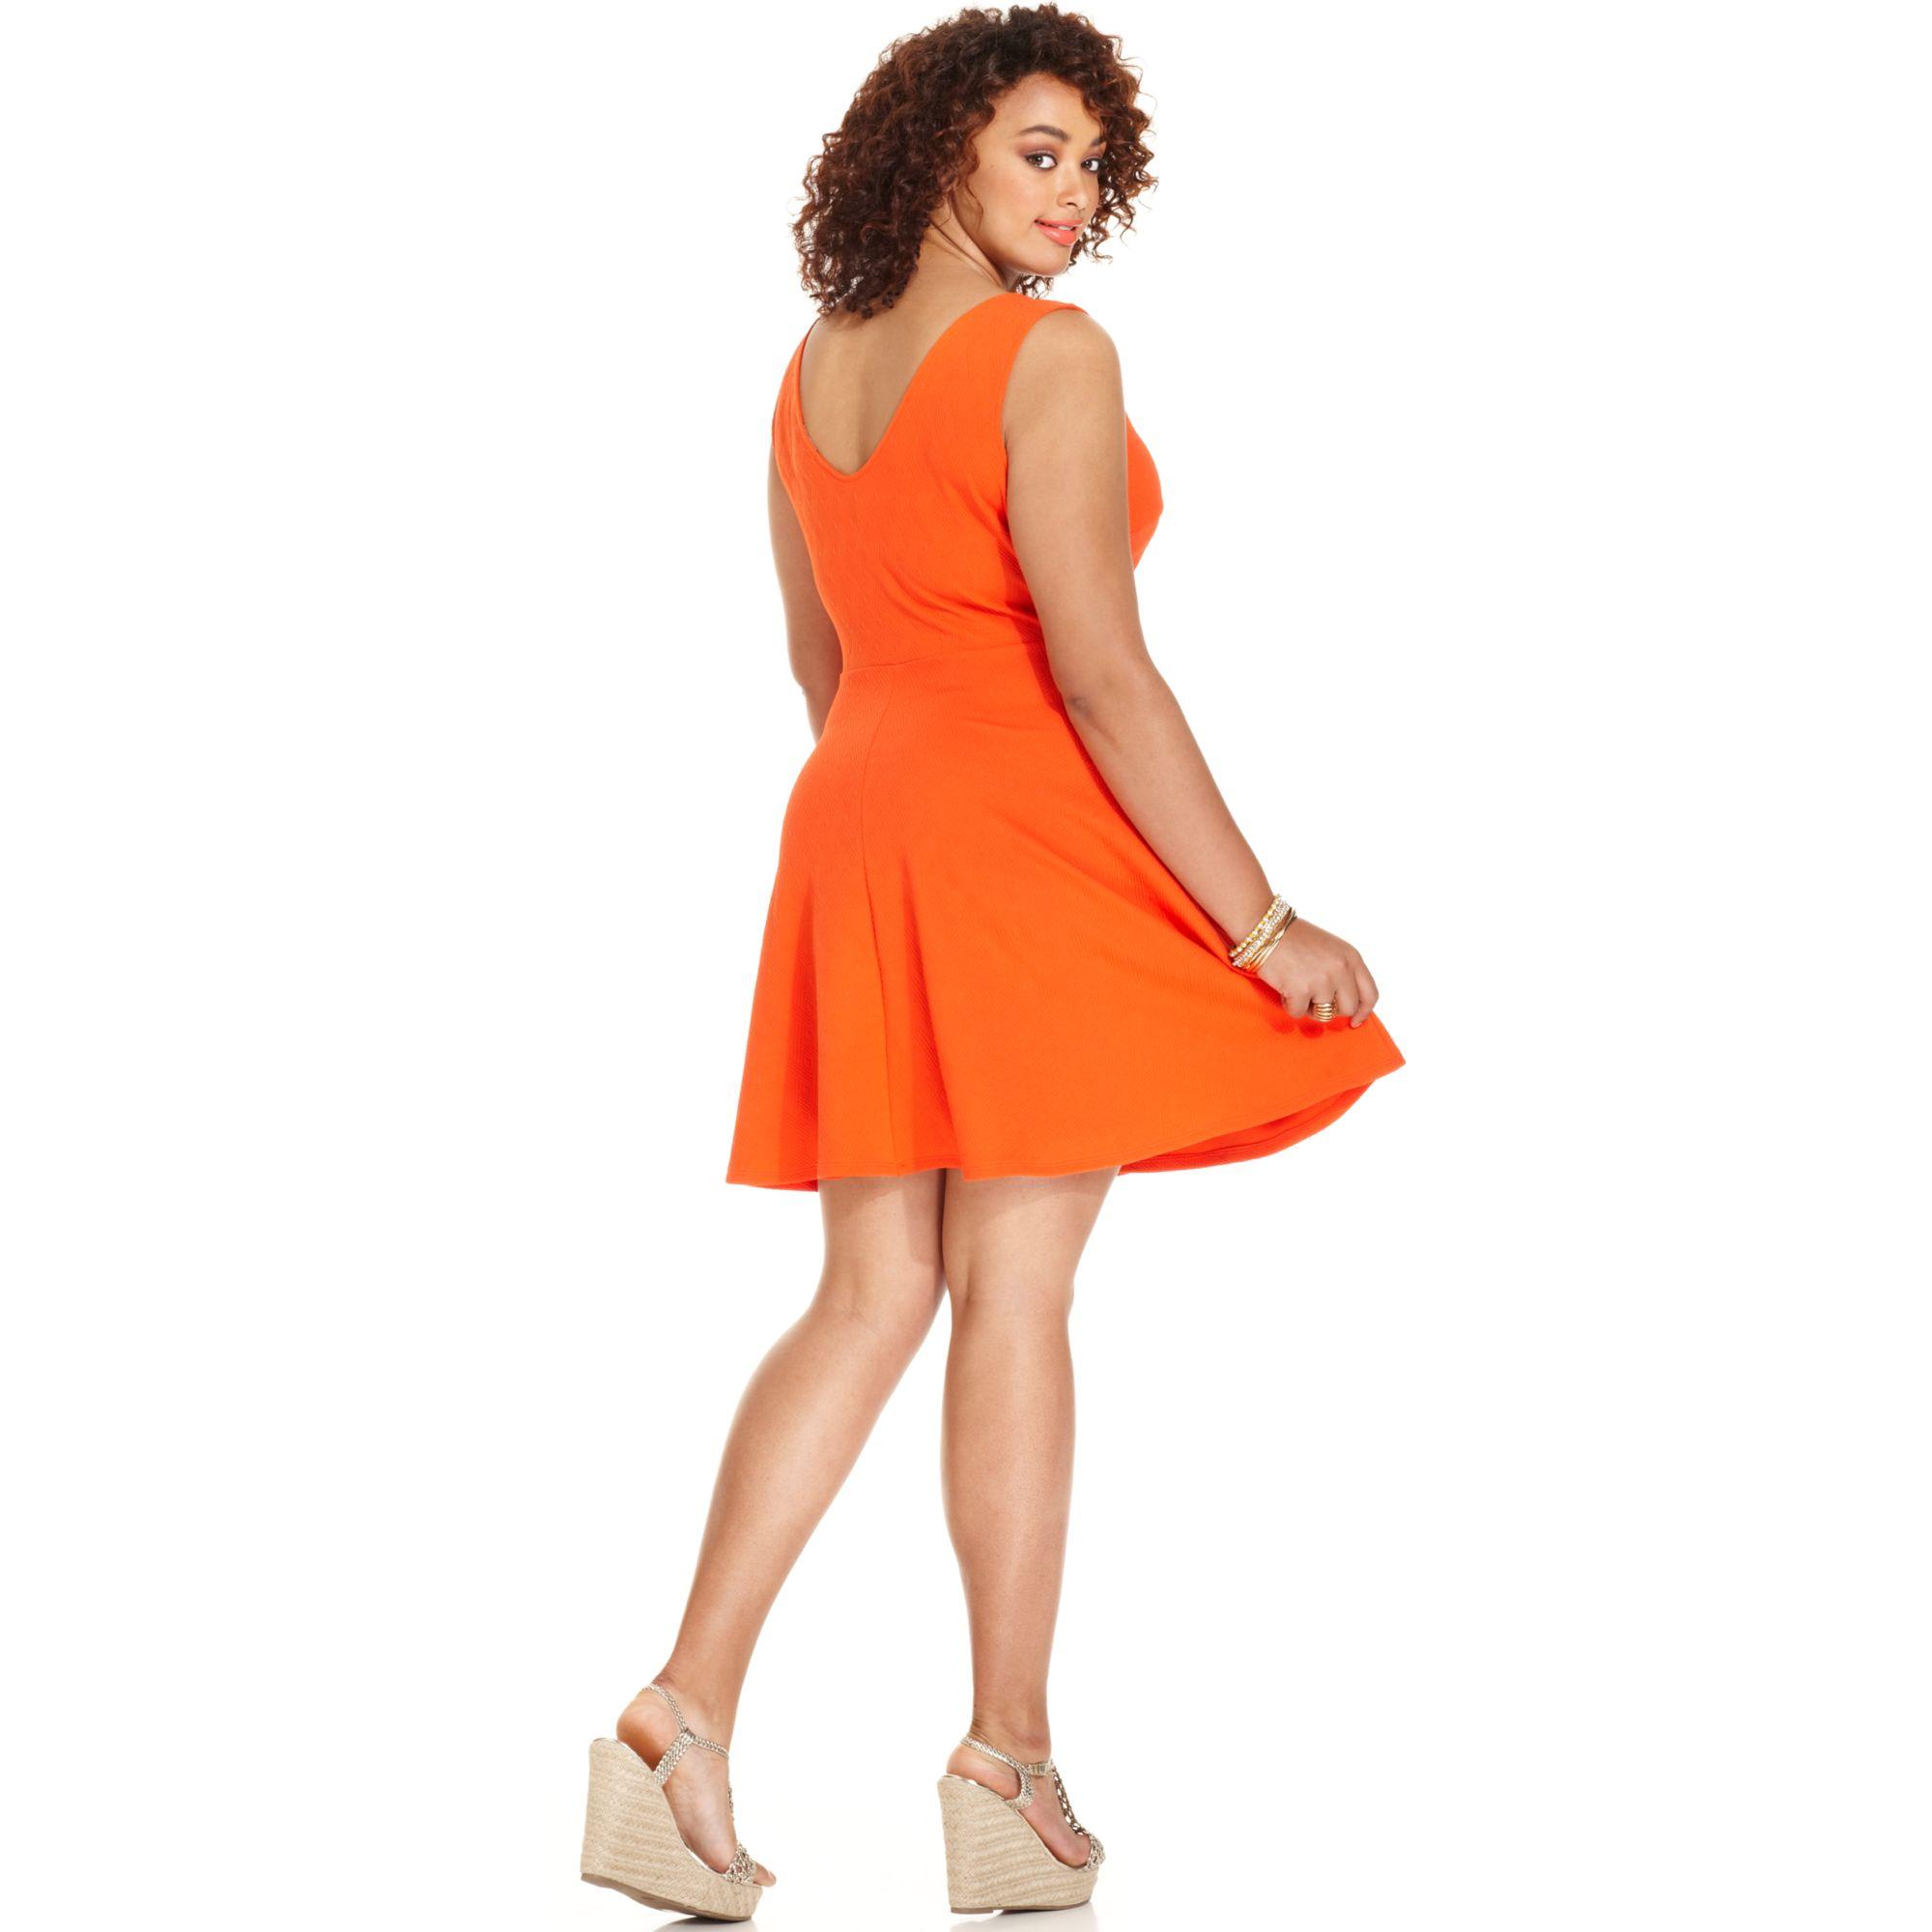 77b957142d Soprano Plus Size Sleeveless Skater Dress in Orange - Lyst